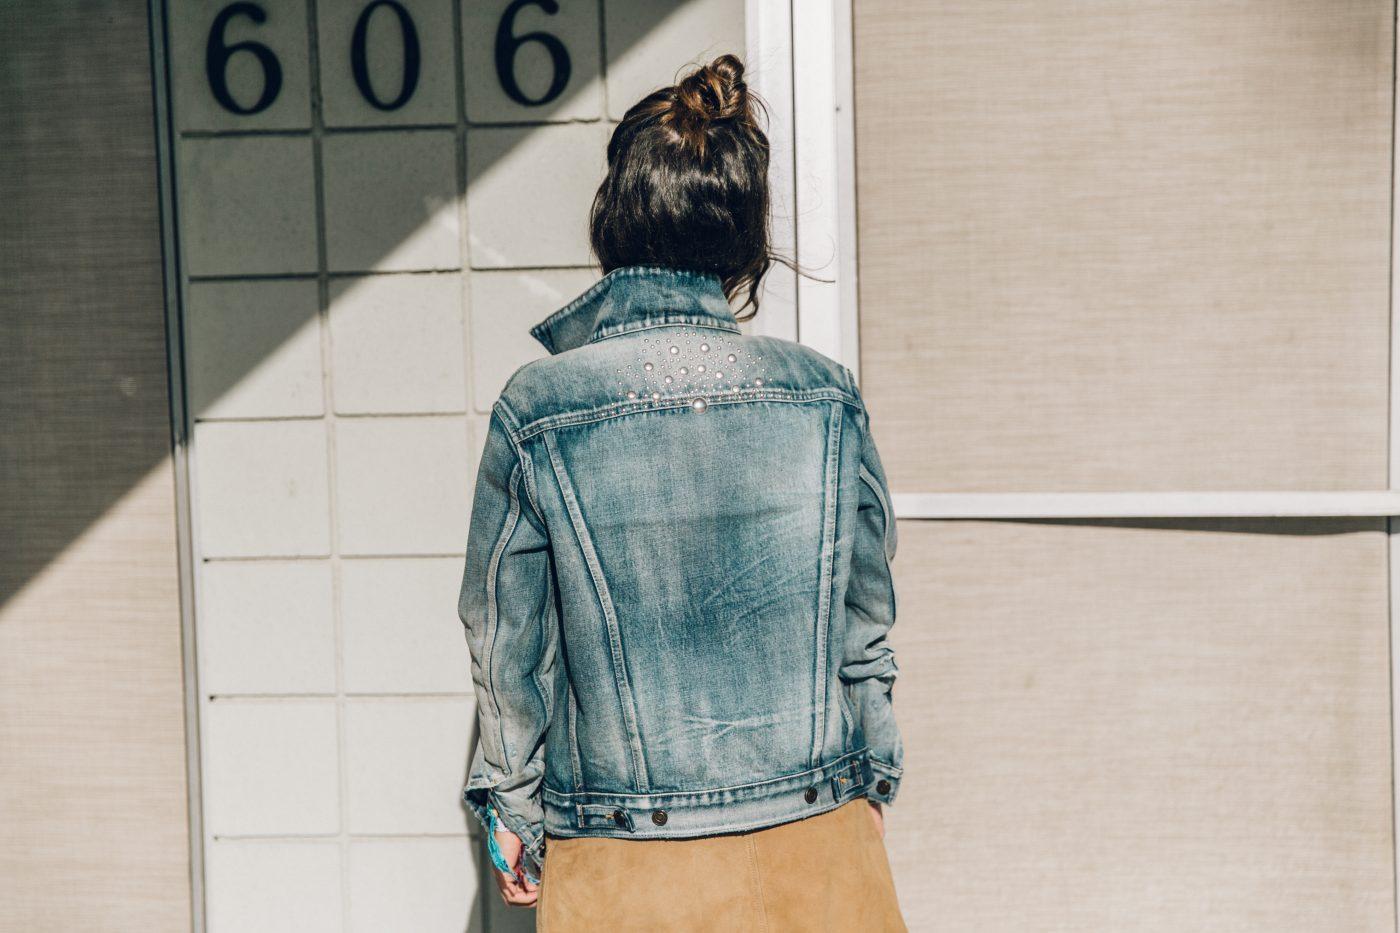 Denim_Jacket-Saint_Laurent-Chloe_Top-Suede_Skirt-Chloe_Hudson_Bag-Espadrilles-Coachella-Palm_Springs-Outfit-Collage_Vintage-27